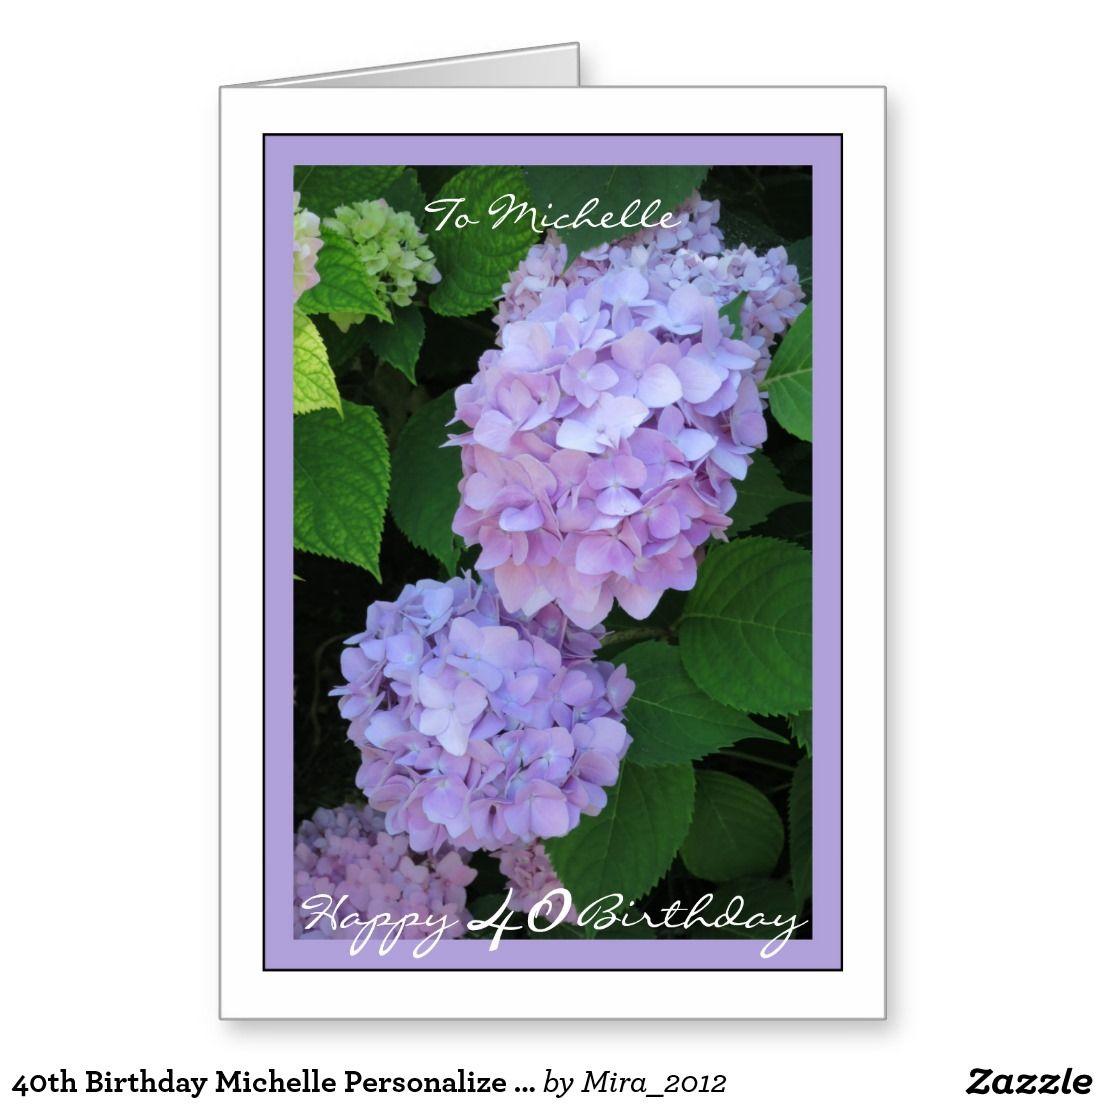 40th Birthday Michelle Personalize Hydrangeas Card 40 Birthday And